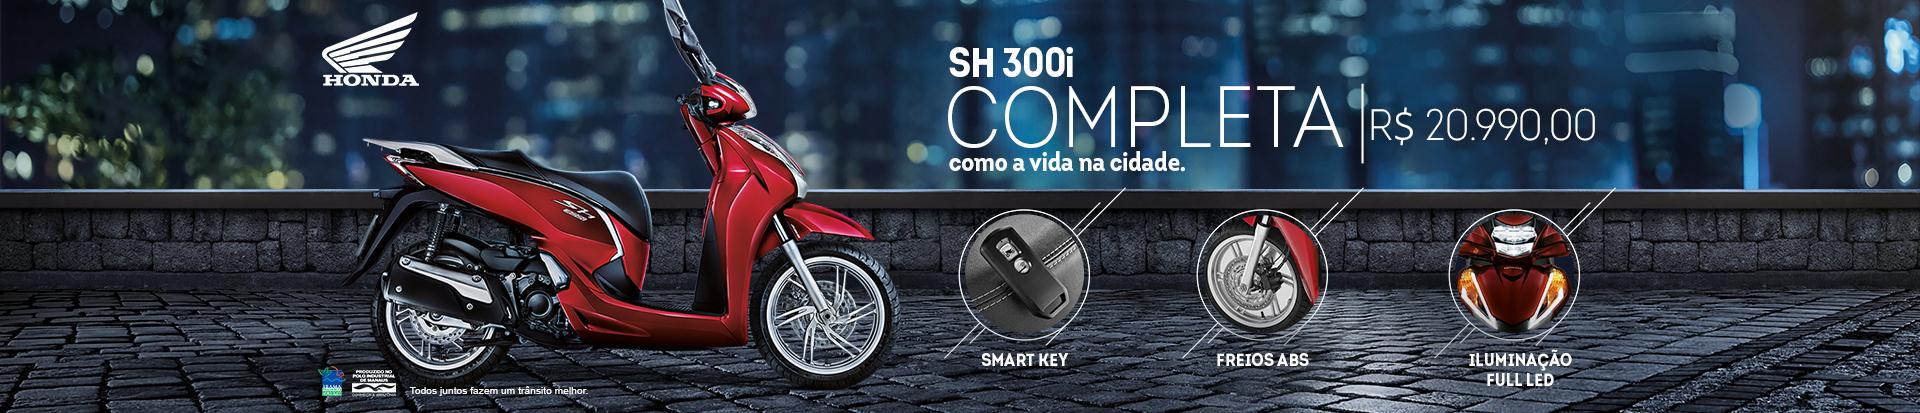 sh300